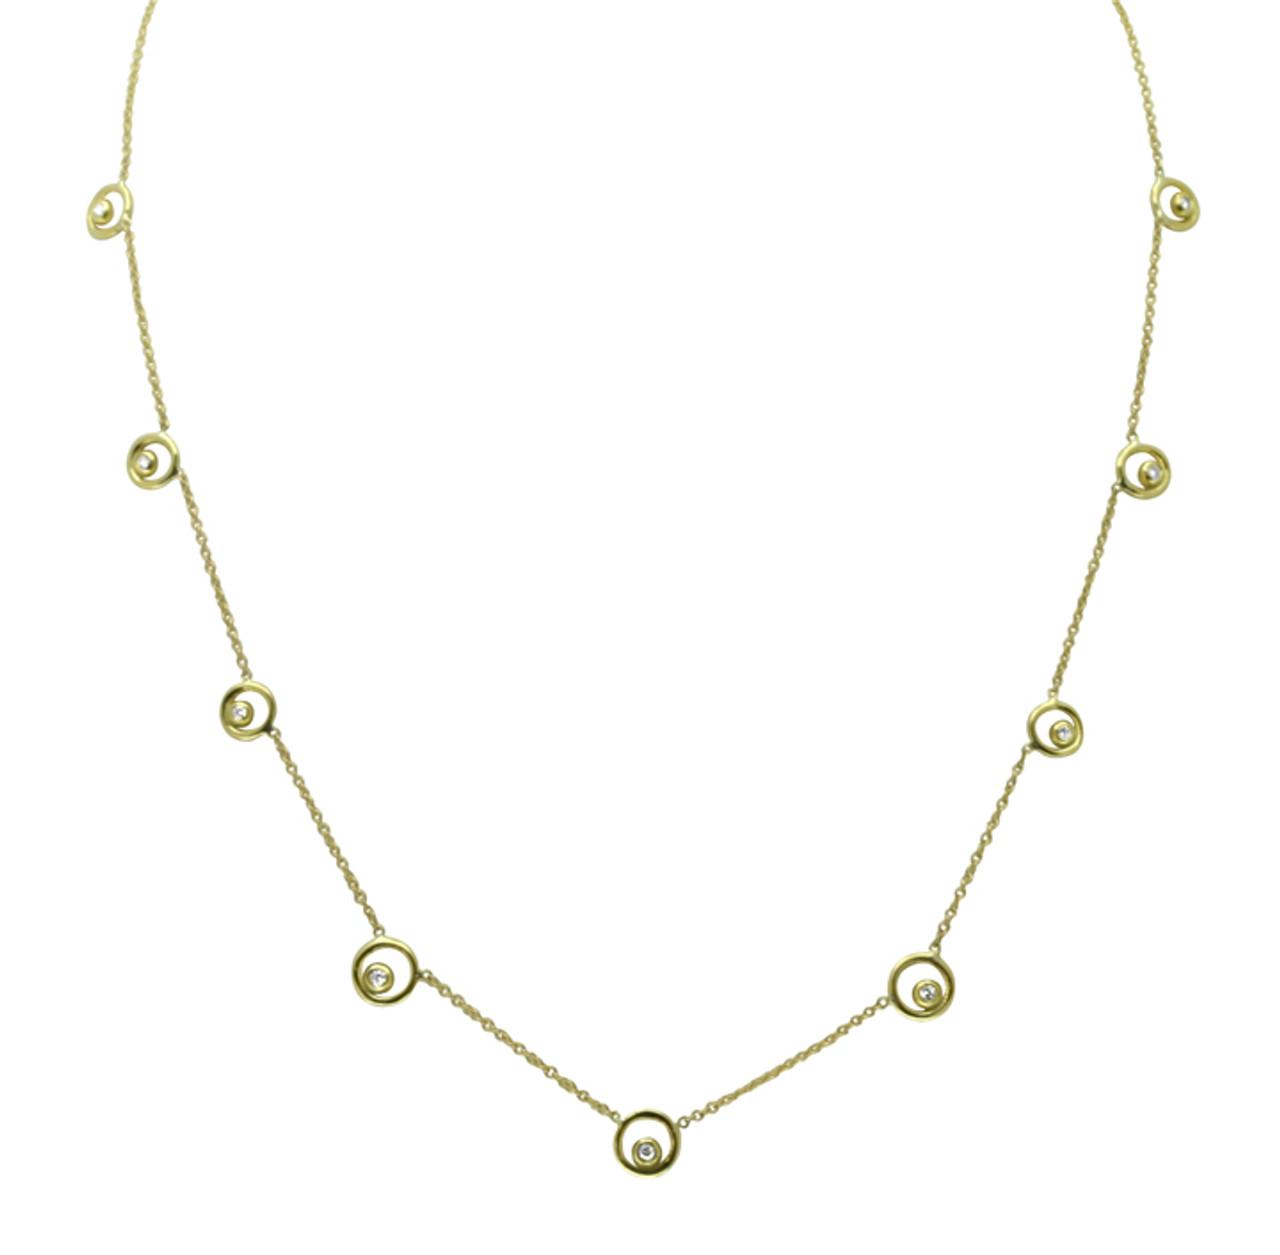 Karma Chain- 18K Gold with Ripples of Diamonds